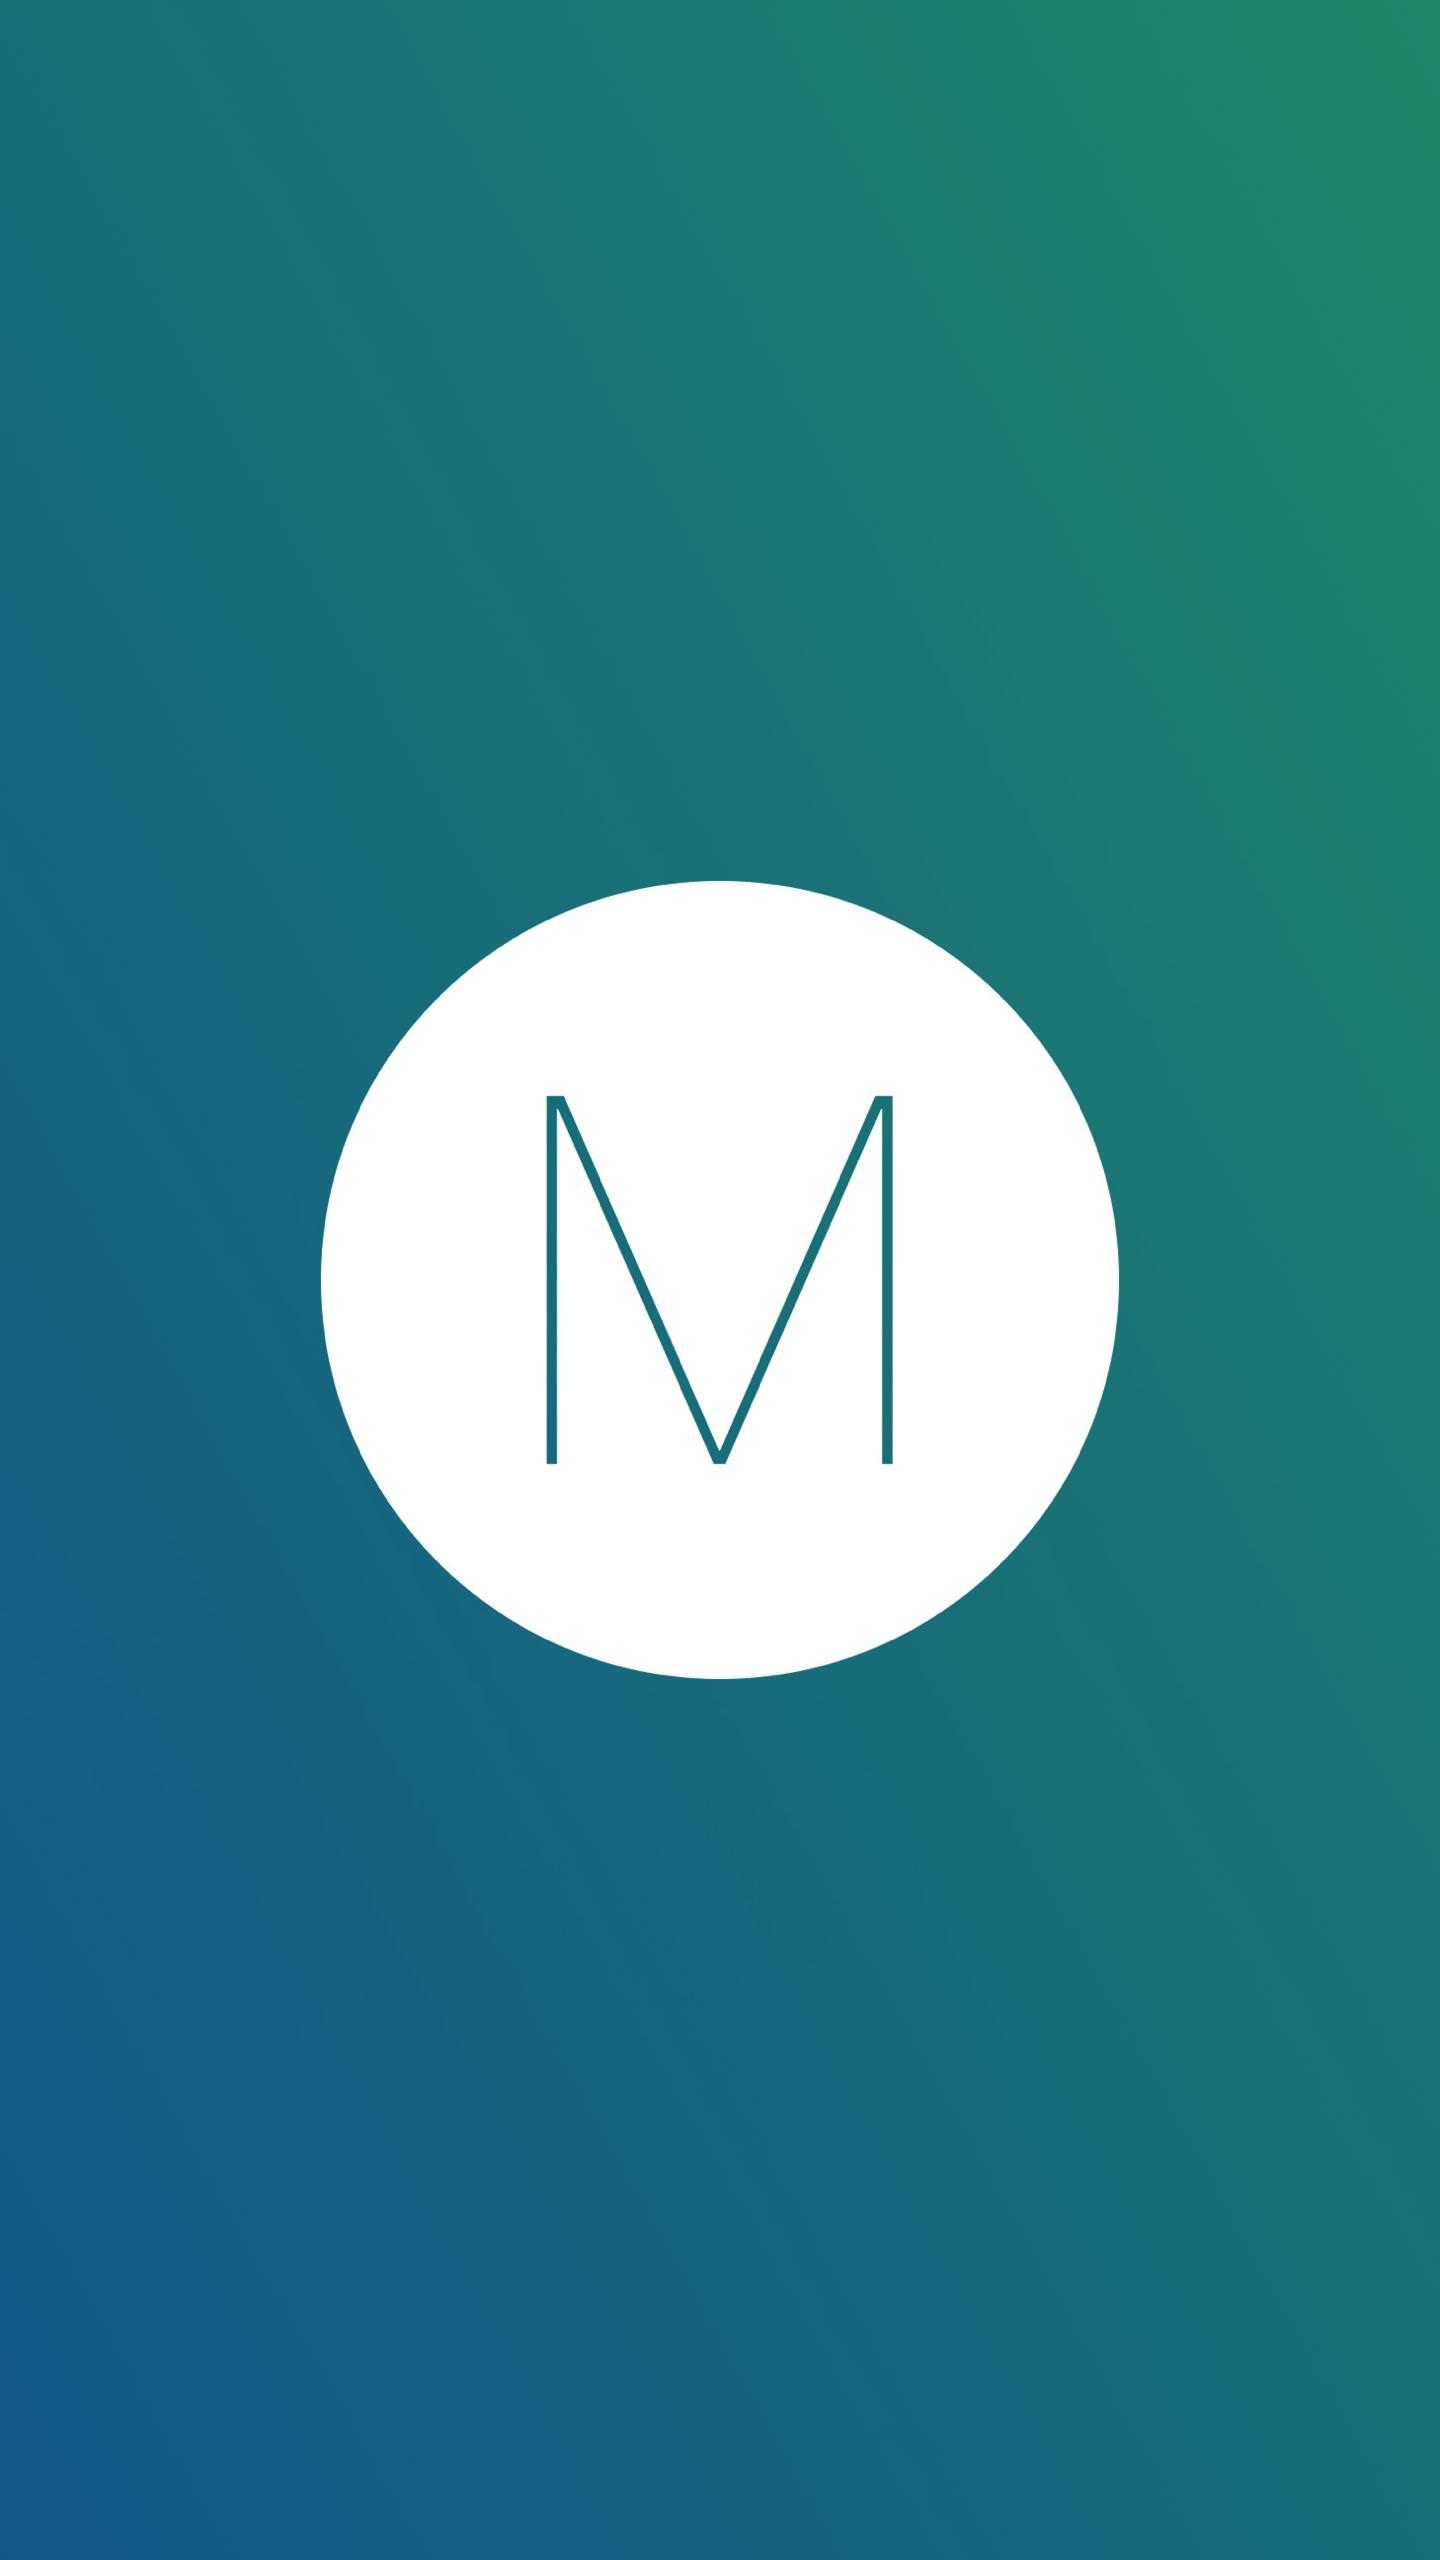 Apple Mavericks Biru Hijau bagus Wallpapersc Android